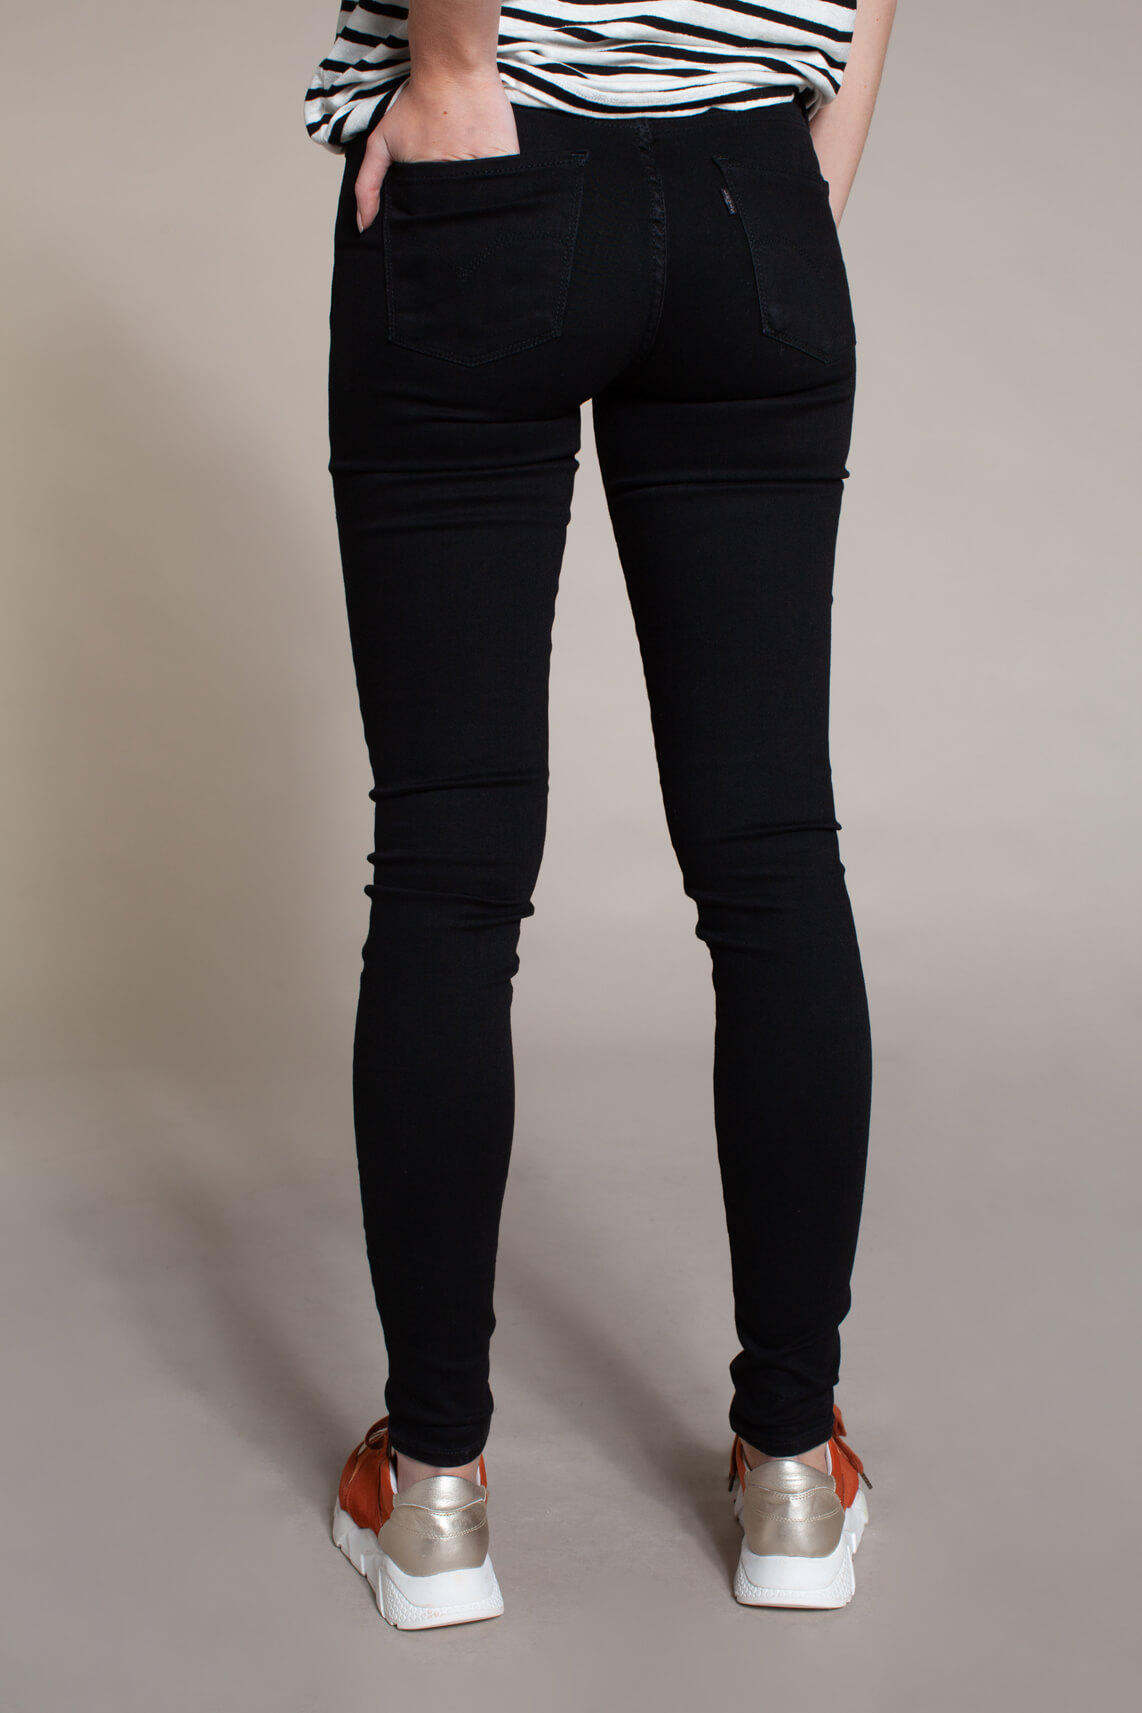 Levi's Dames 311 L30 shaping skinny jeans Zwart